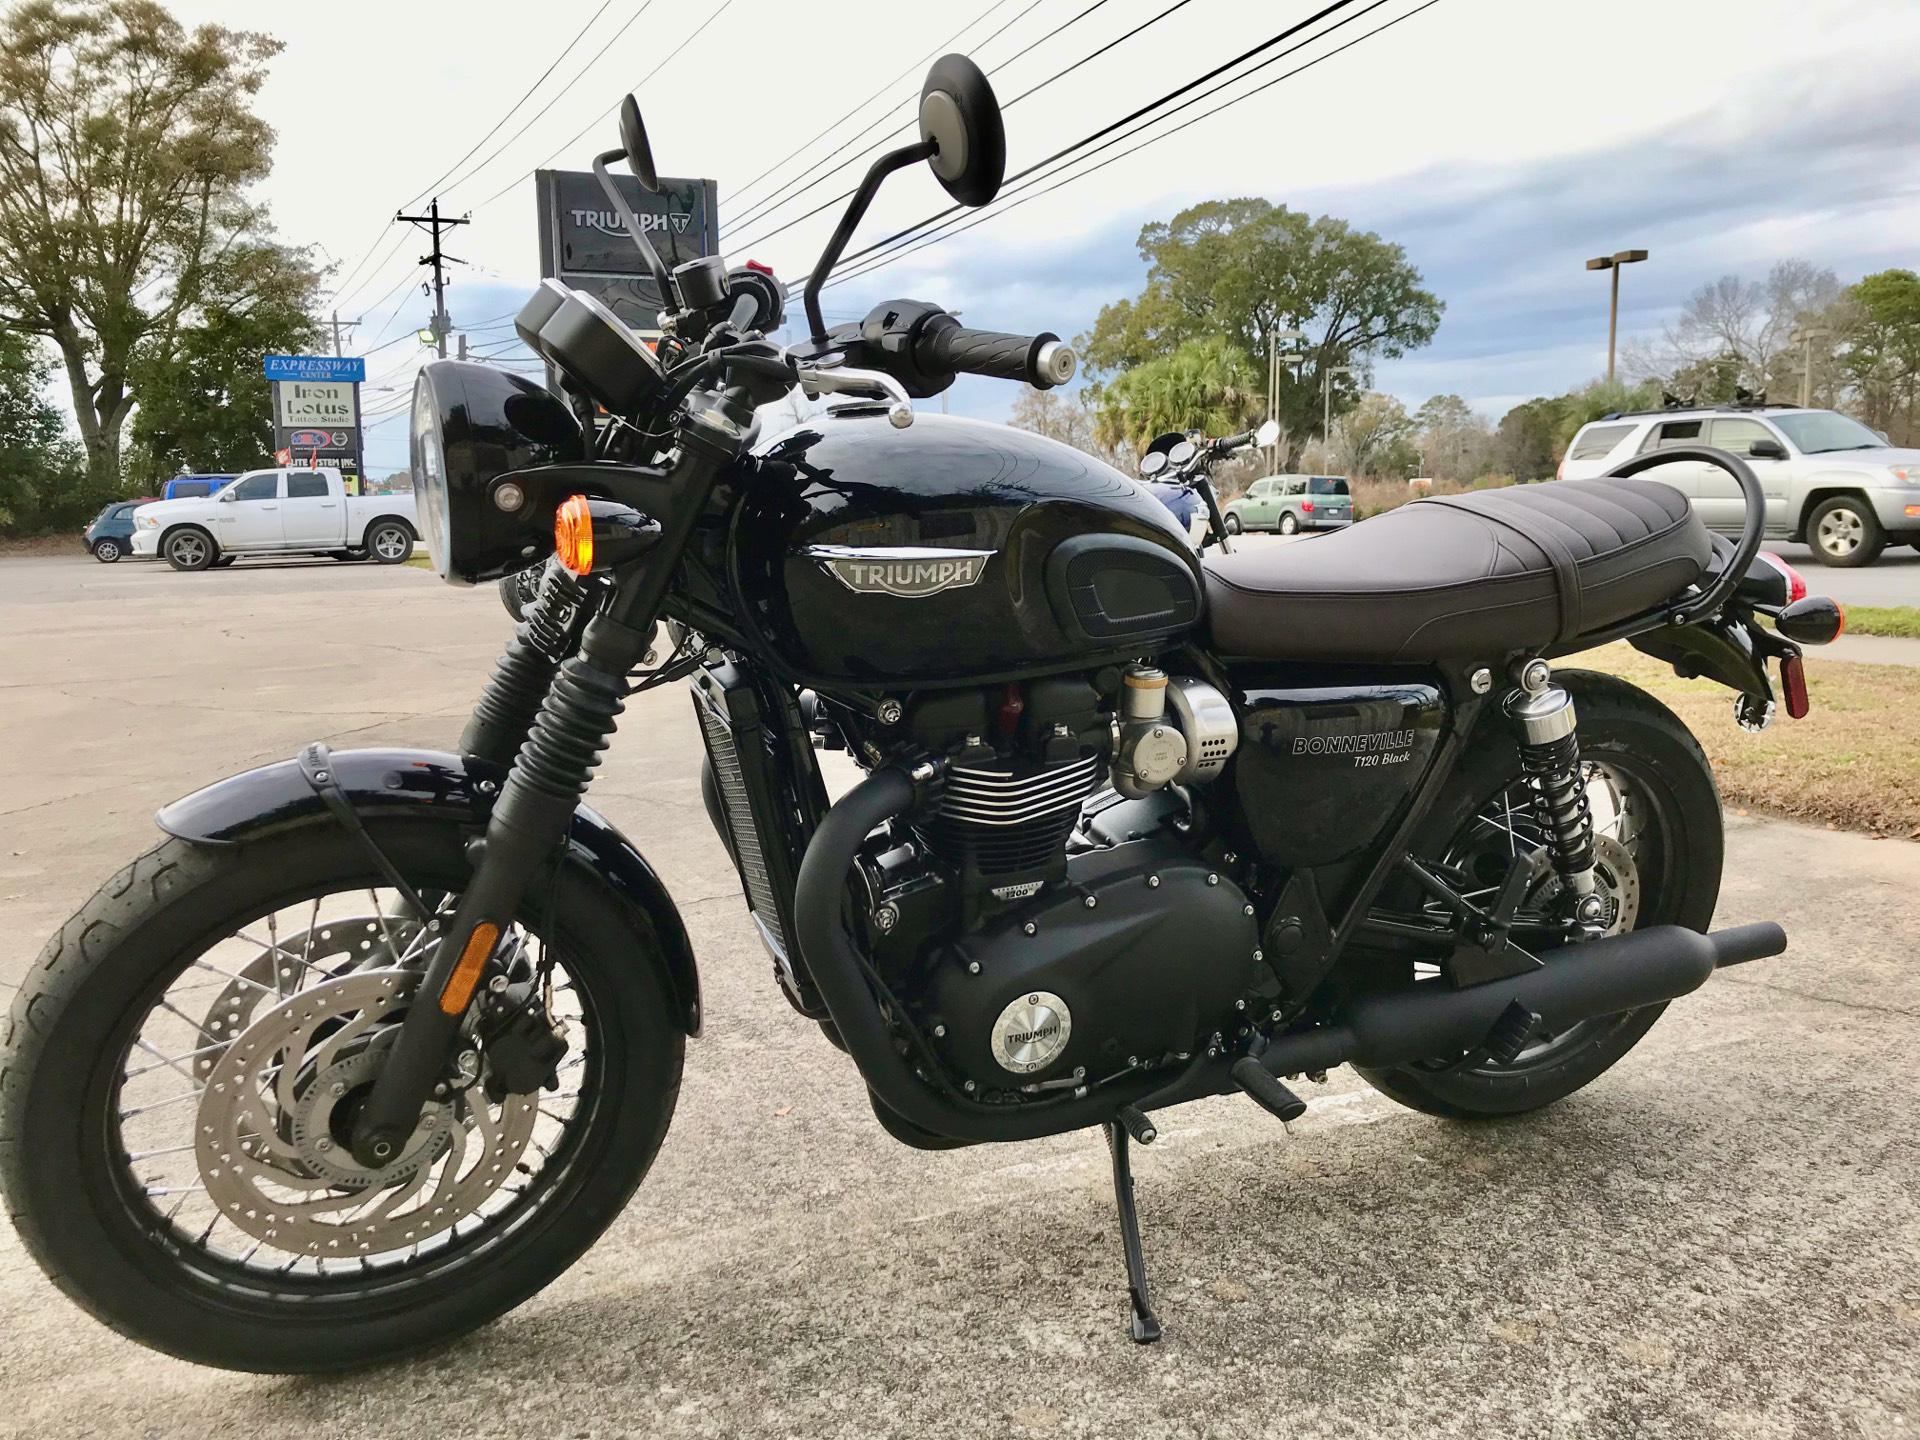 New 2020 Triumph Bonneville T120 Black Motorcycles In Charleston Sc Triab0931 Jet Black